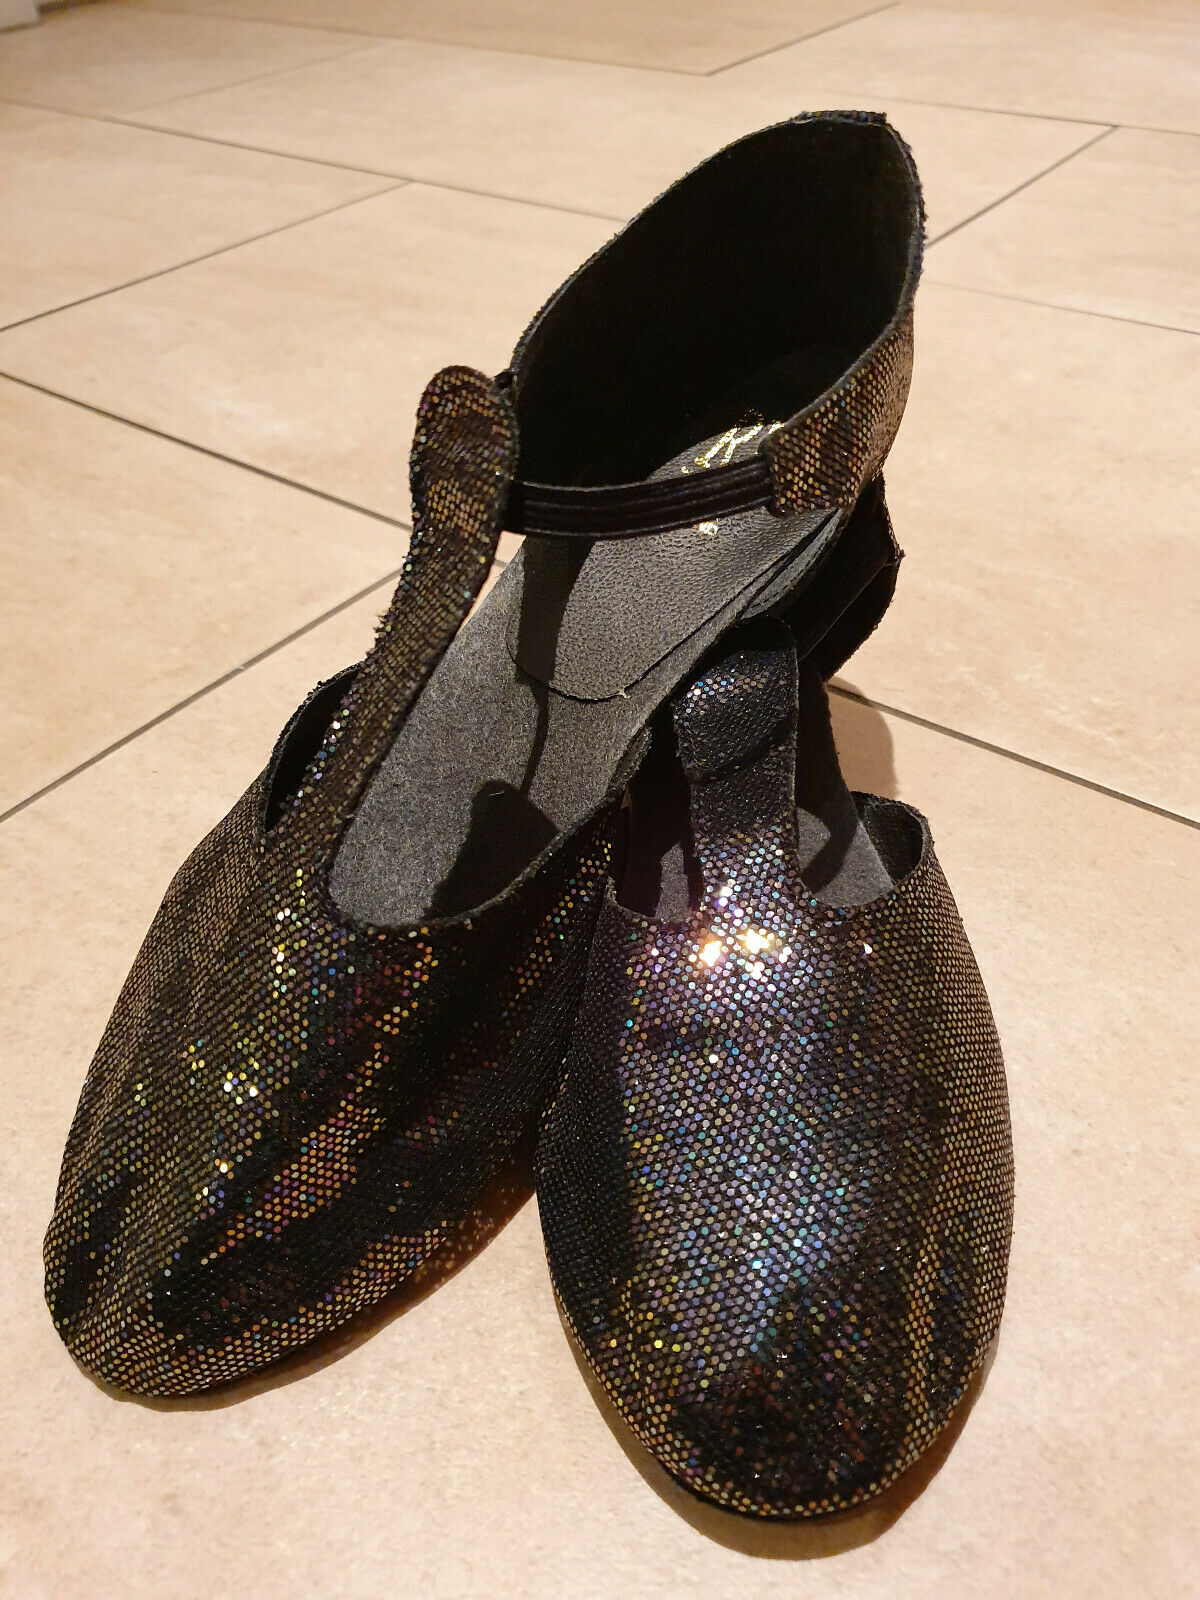 Roch Valley griechische Sandalen HGS - Tanzschuhe schwarz Glitzer